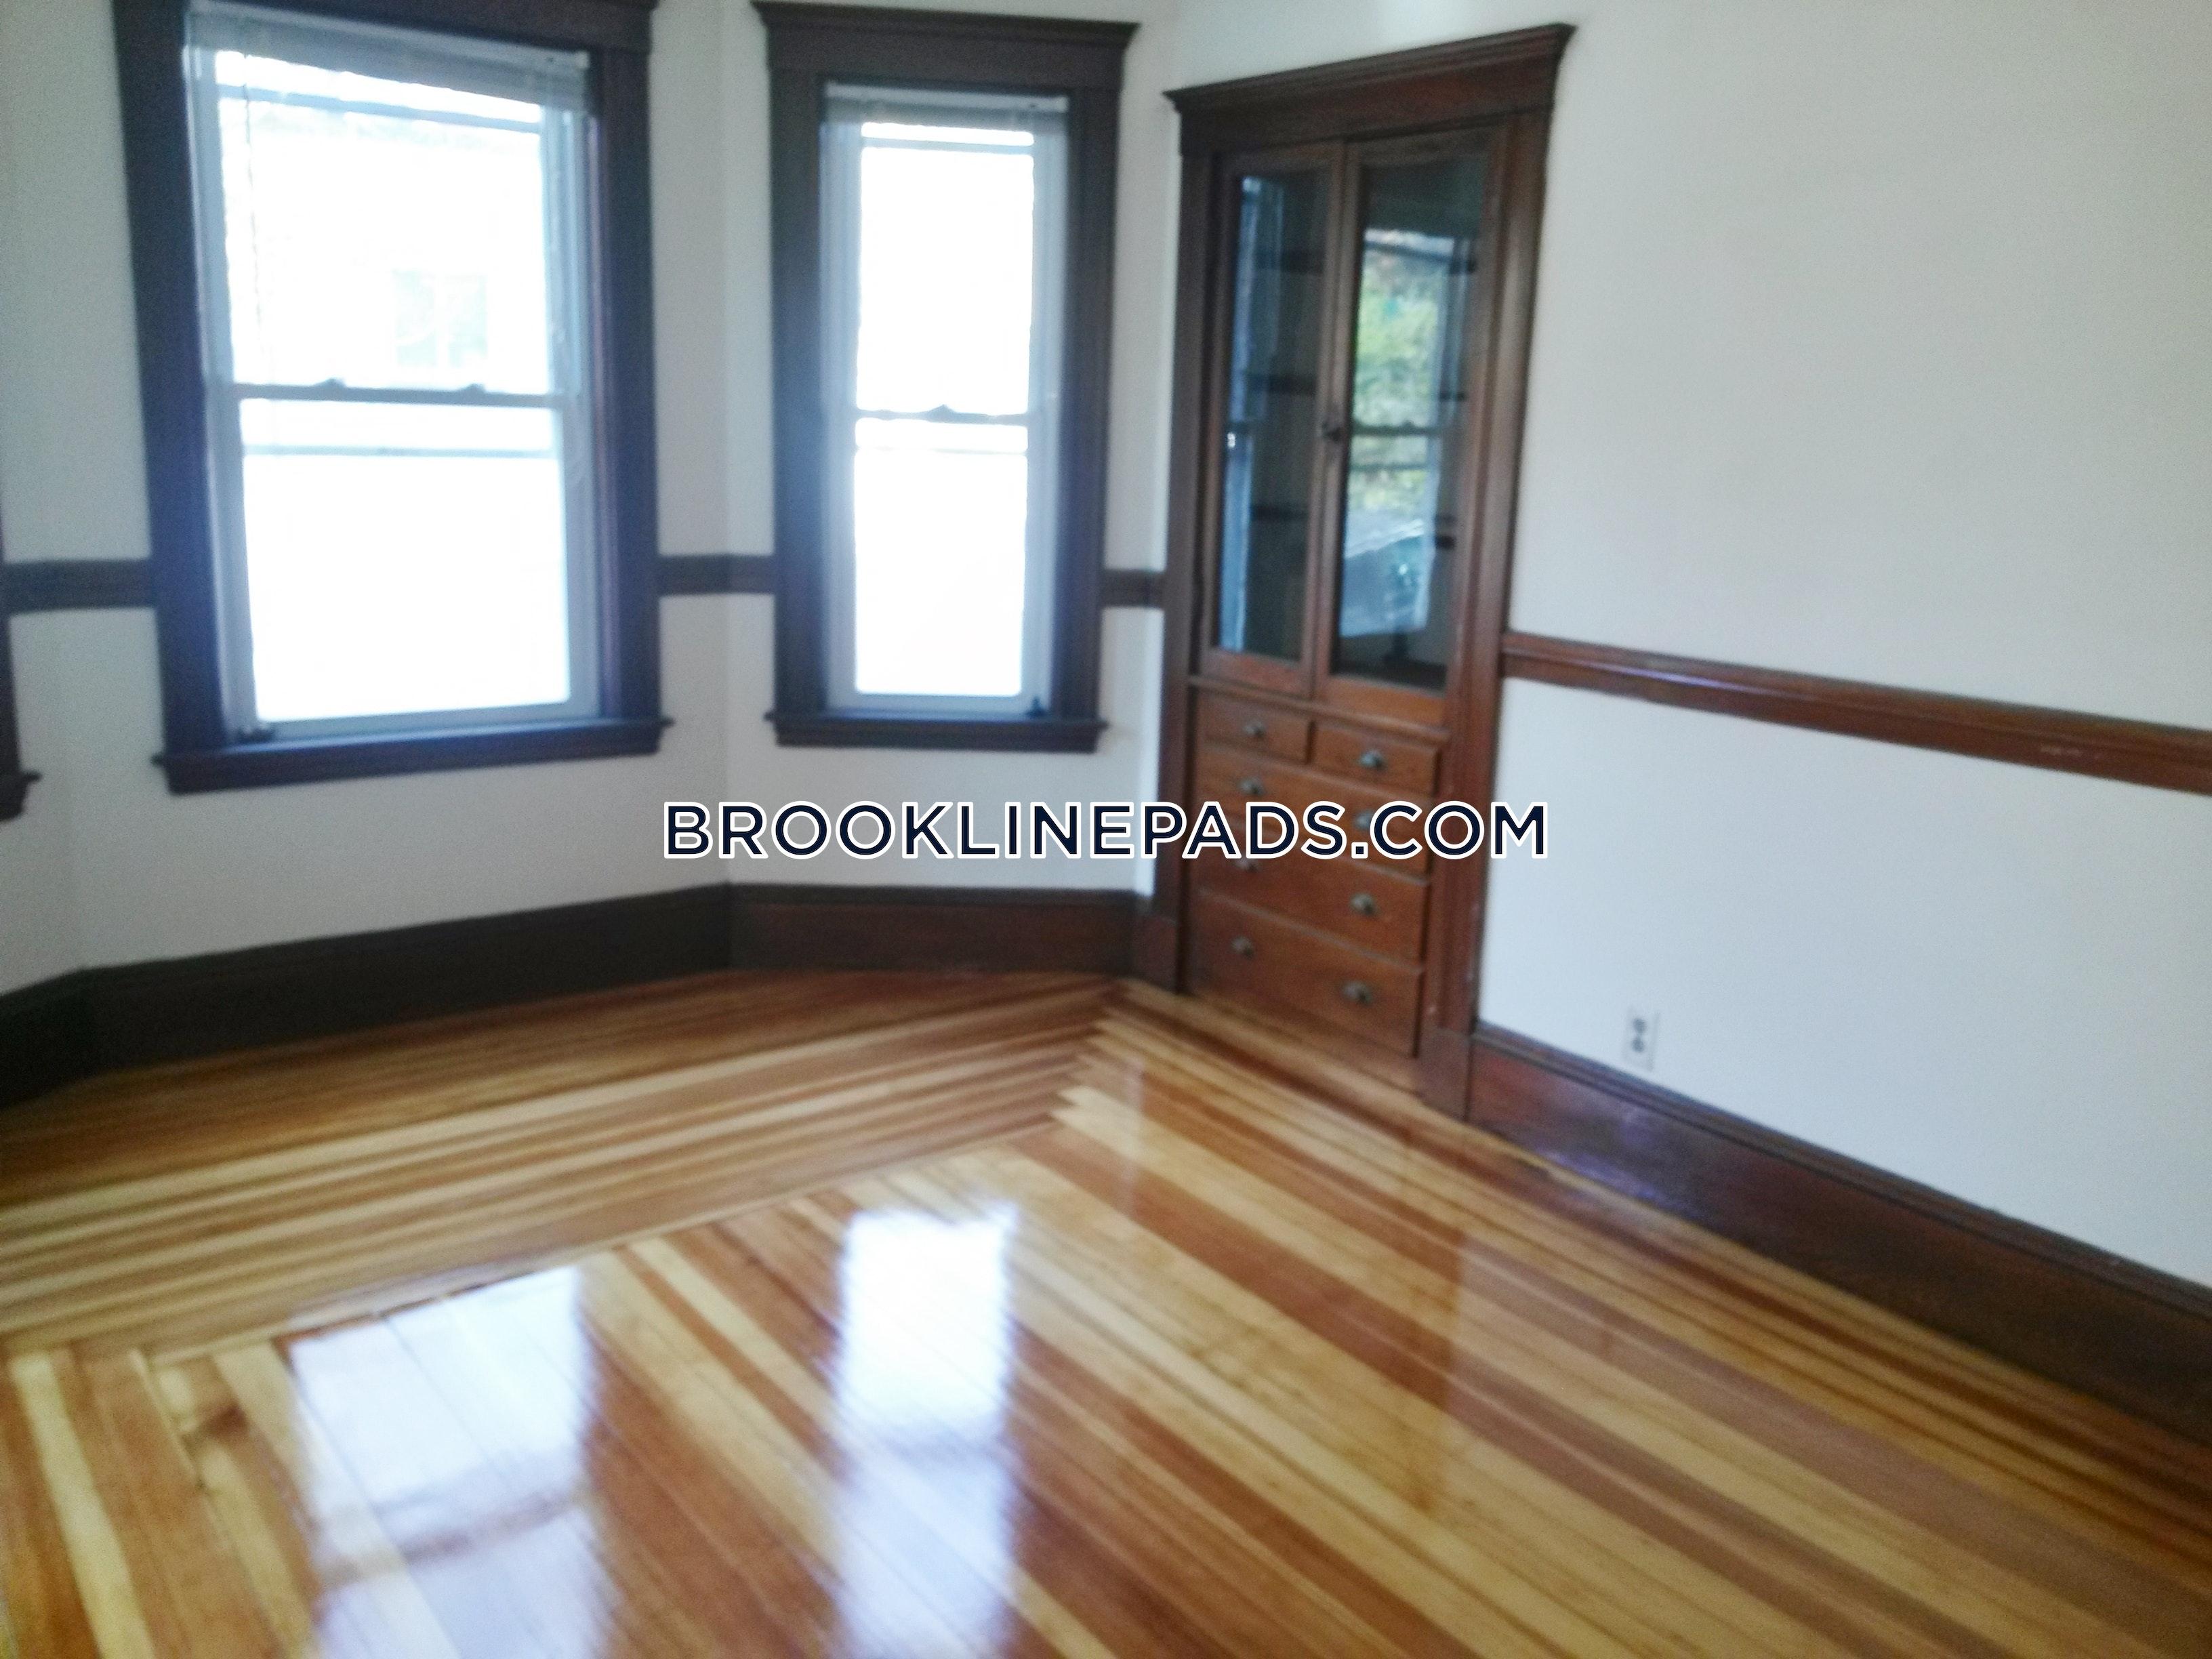 3-beds-1-bath-brookline-chestnut-hill-2900-379809